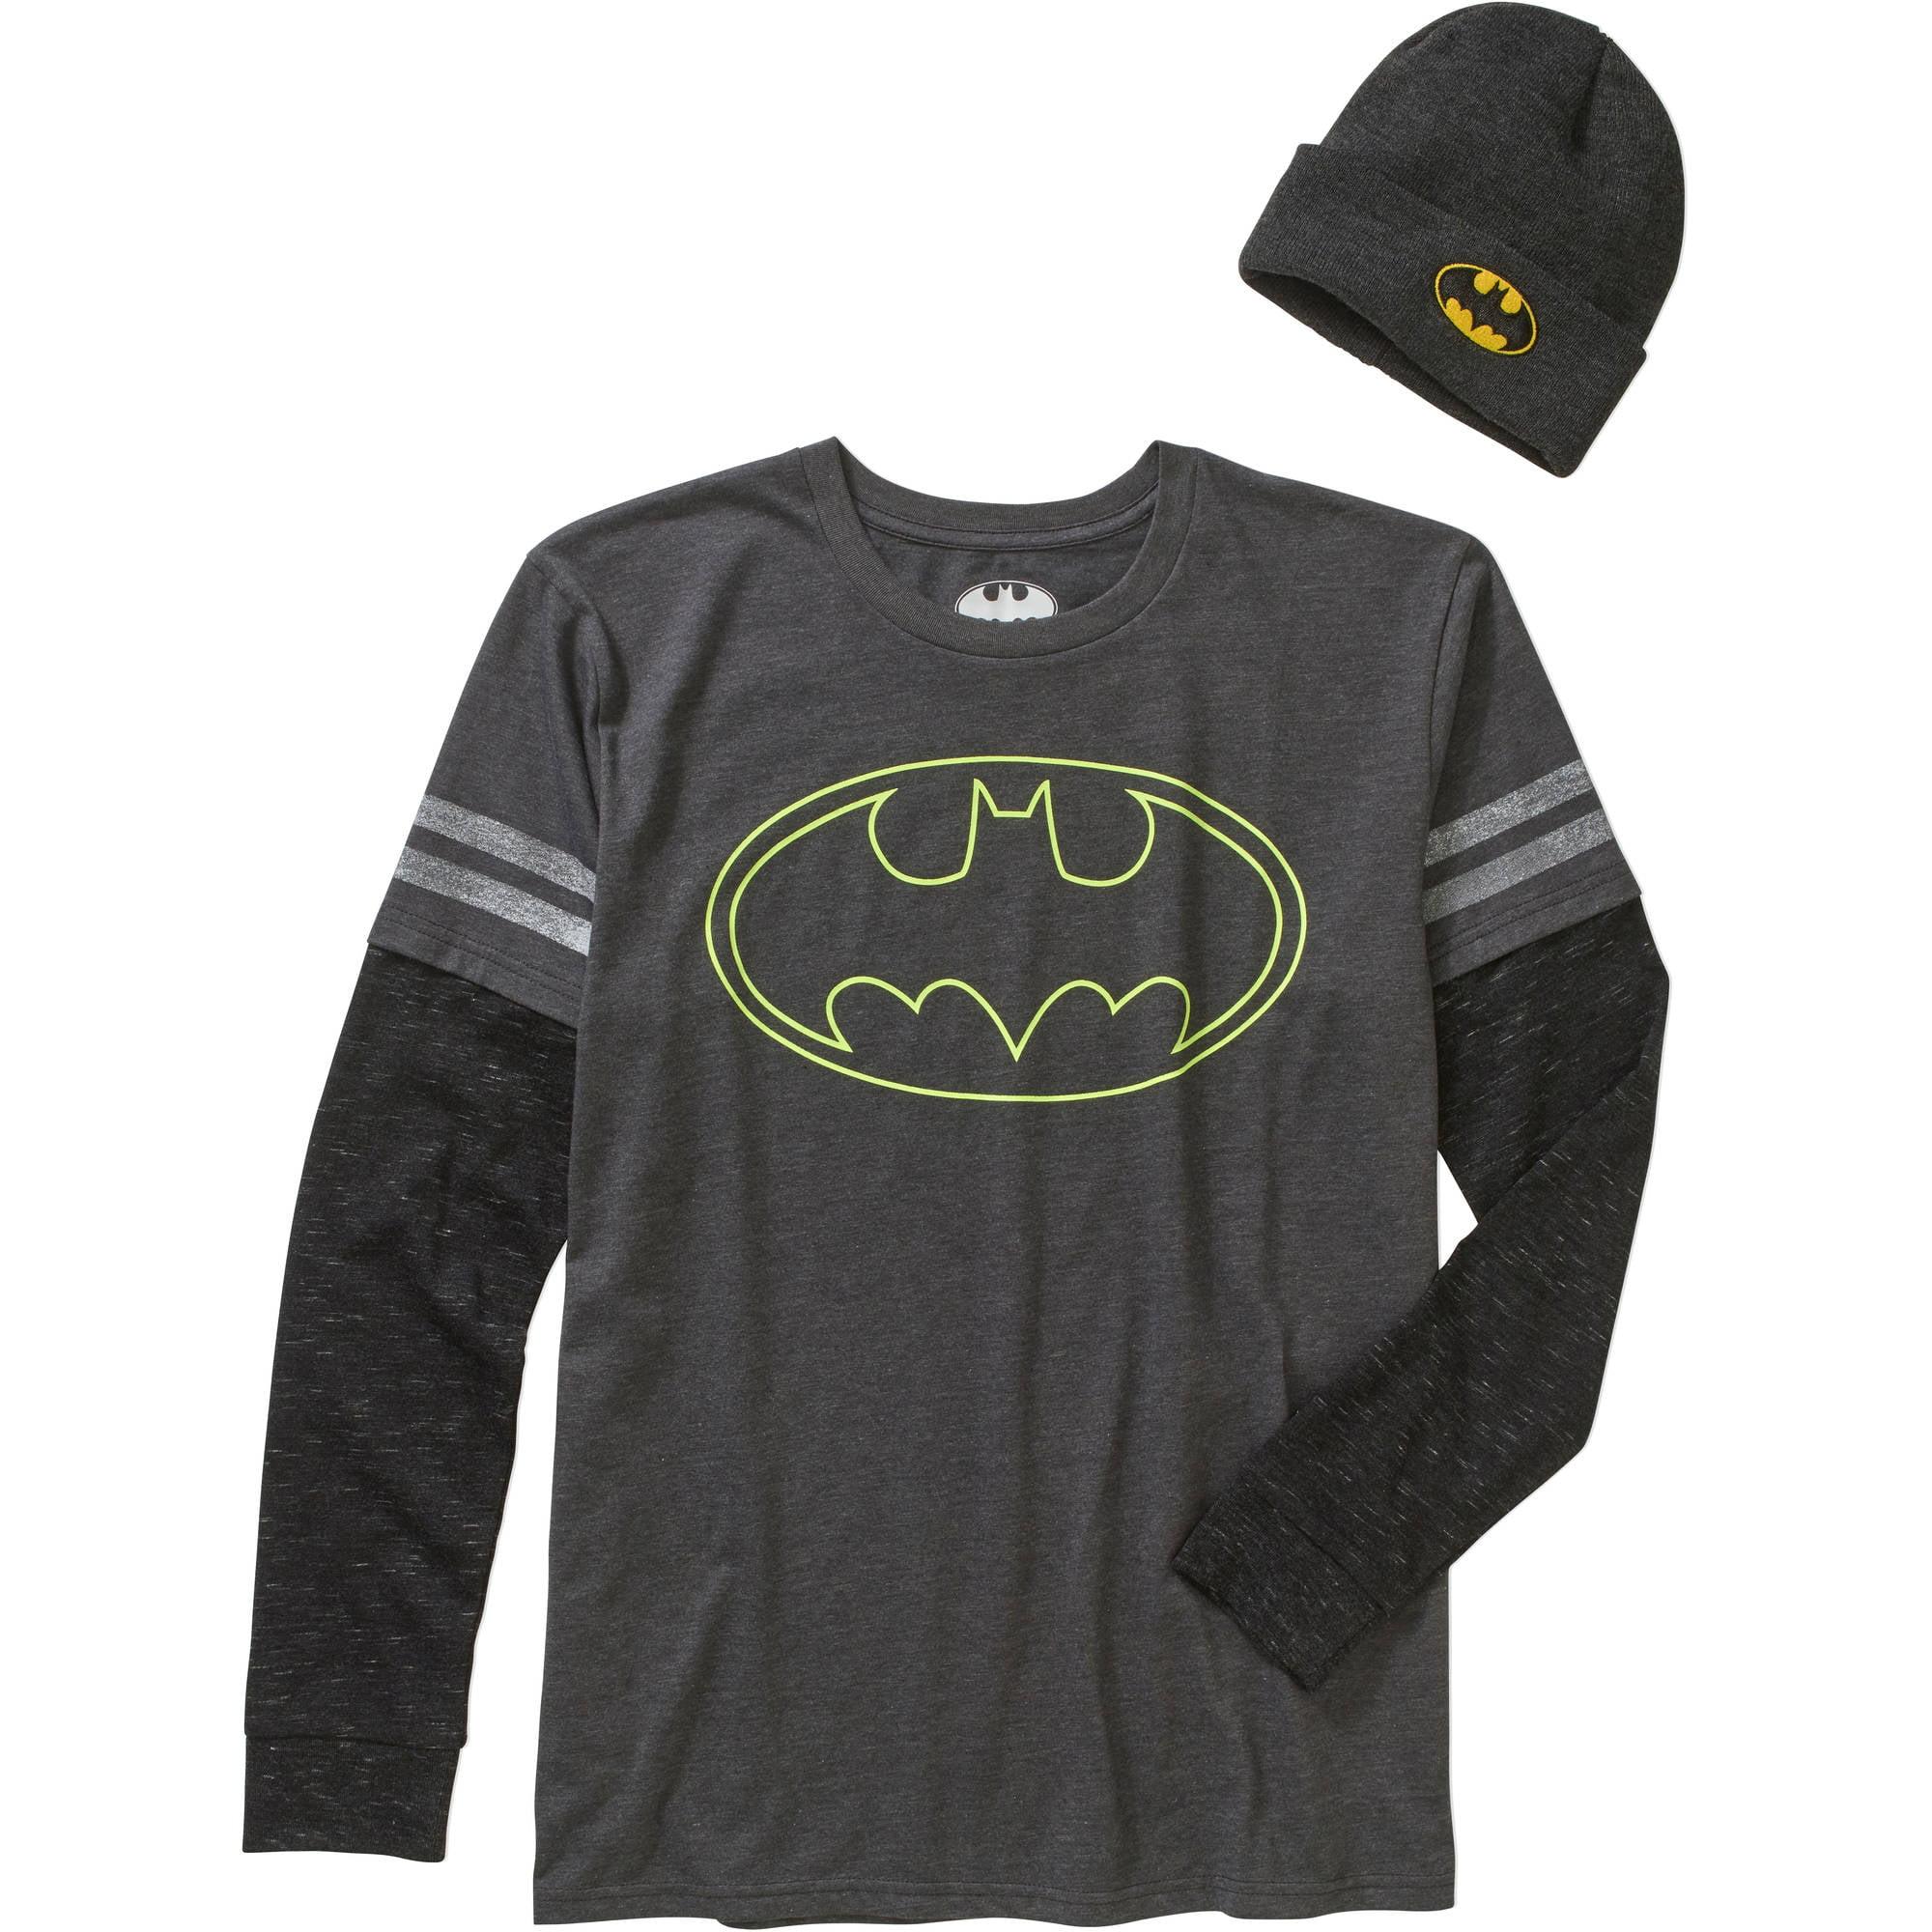 Batman Men's Shirt & Beanie Combo